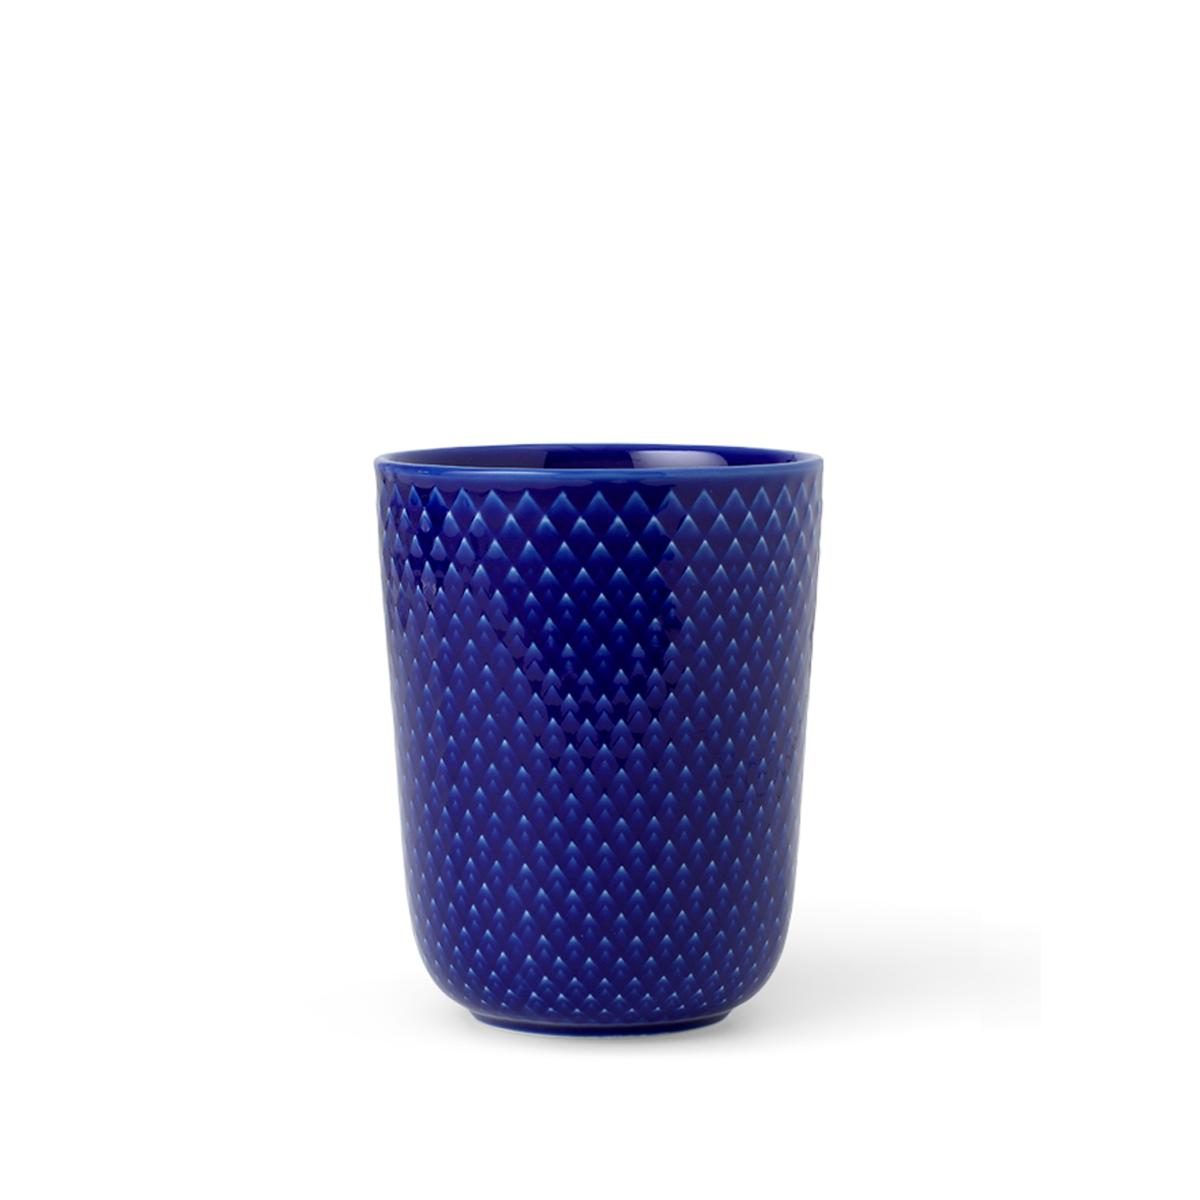 Lyngby Porcelæn - Rhombe Mug 33 cl - Dark Blue (201966)